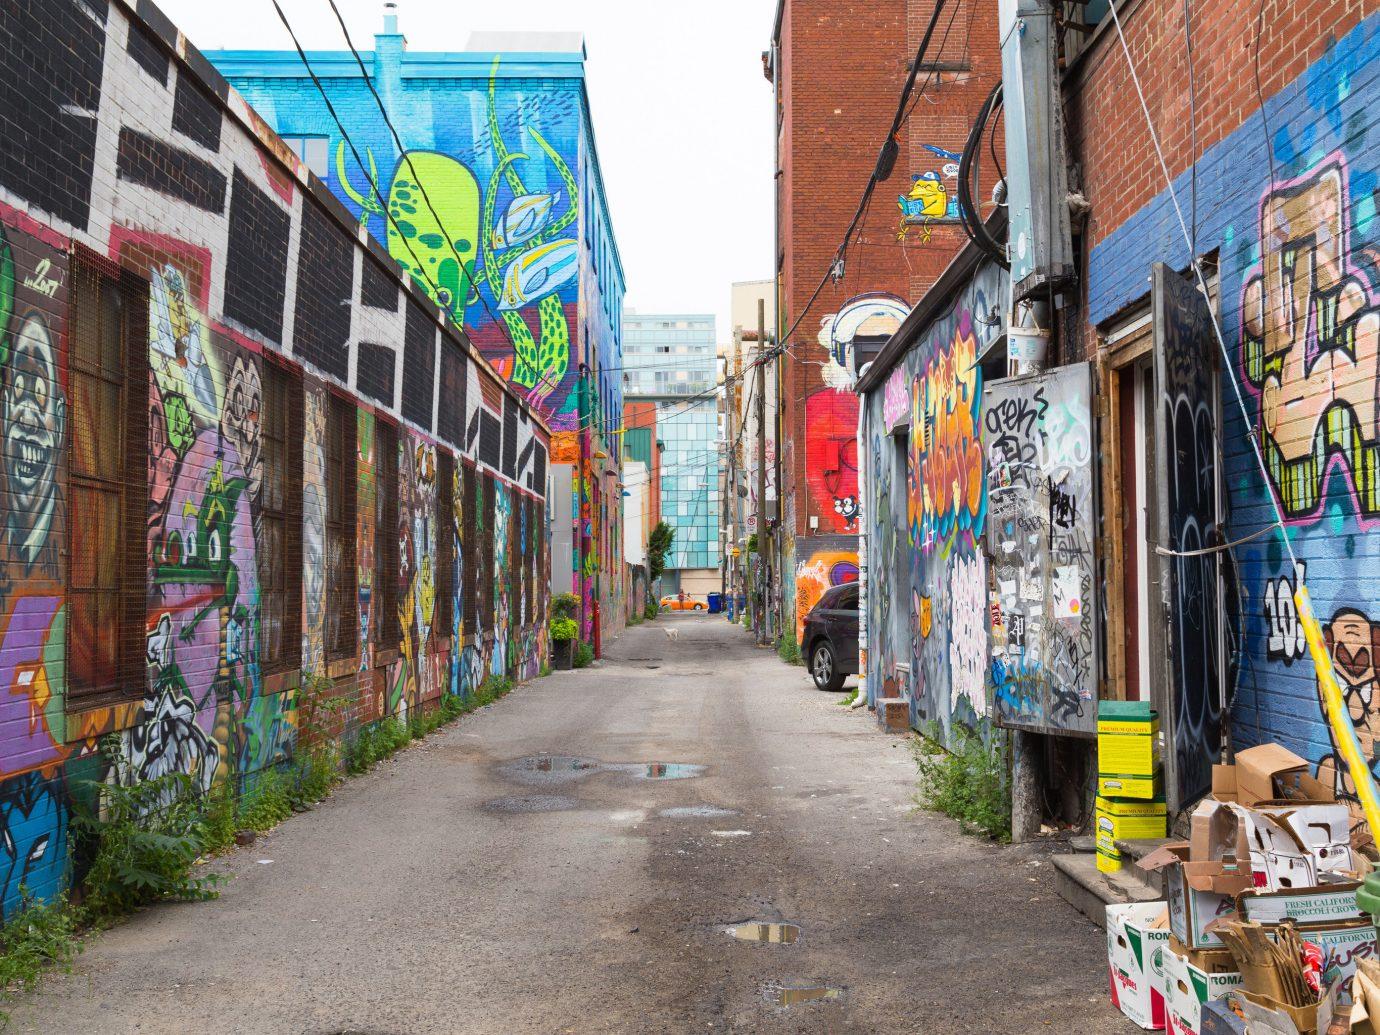 Canada Montreal Toronto Trip Ideas scene way sidewalk outdoor neighbourhood alley Town street urban area road City graffiti art lane mural metropolis street art pedestrian bazaar colorful